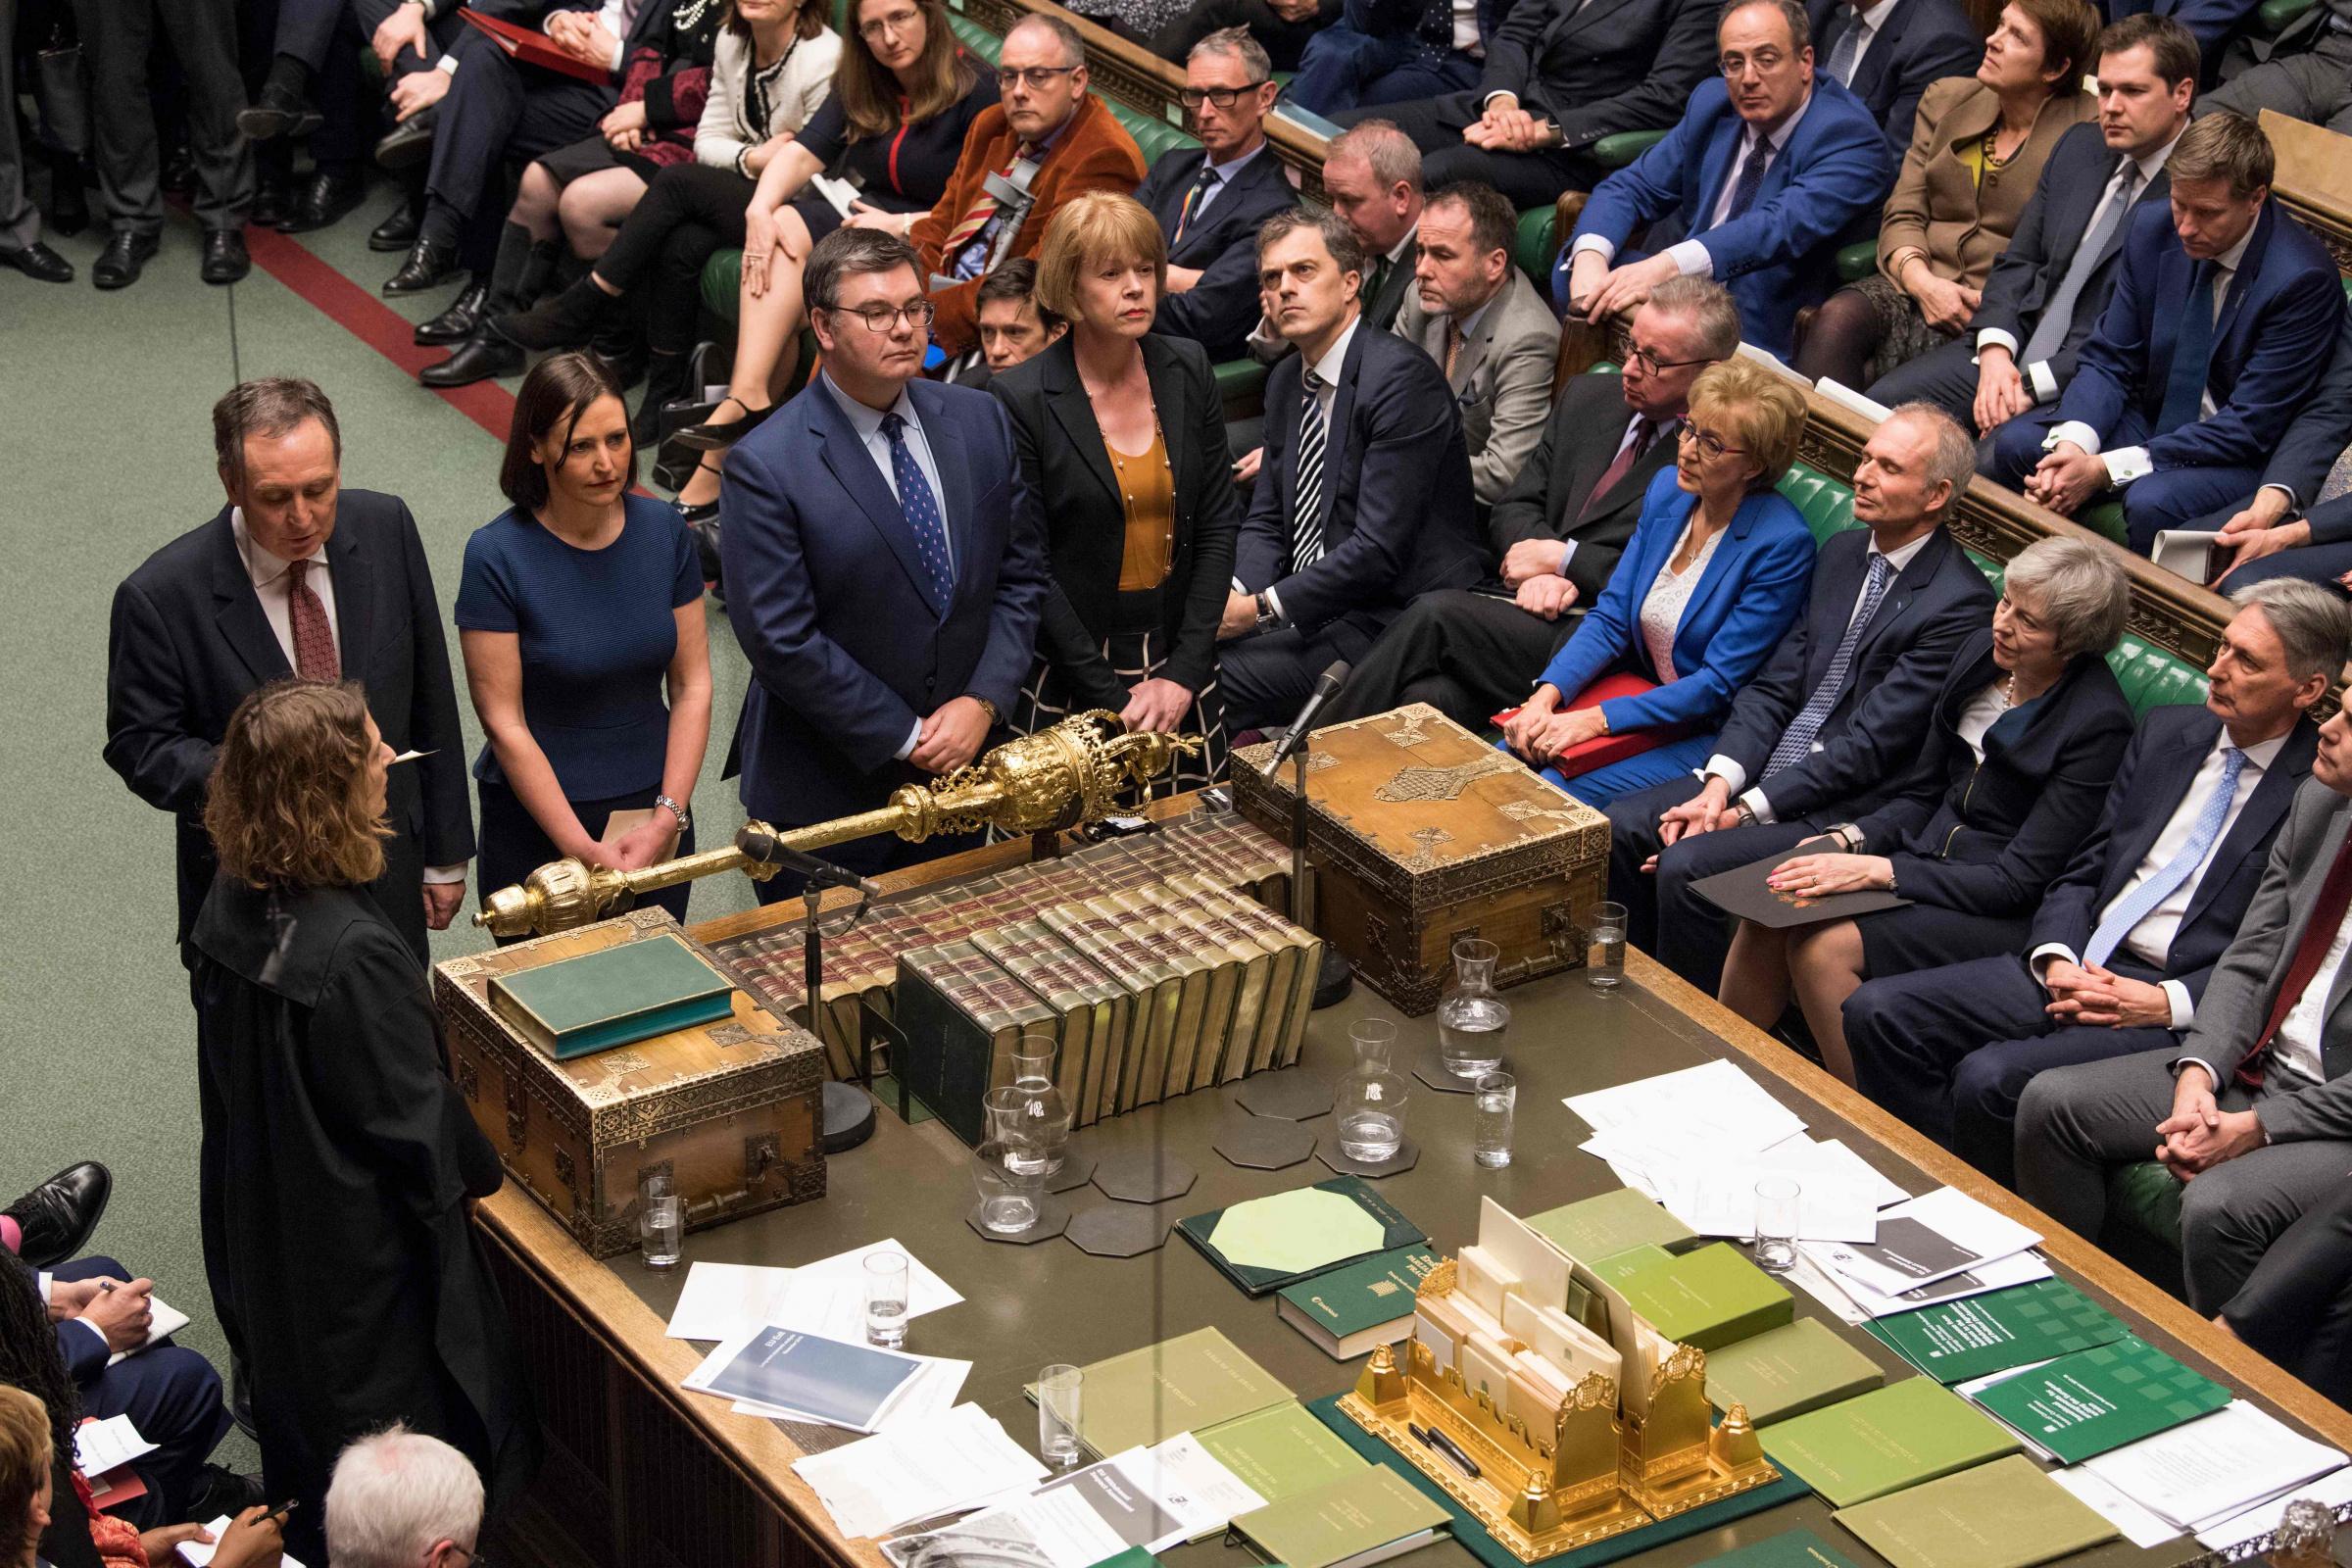 Foto: Mark Duffy / AFP / Scanpix